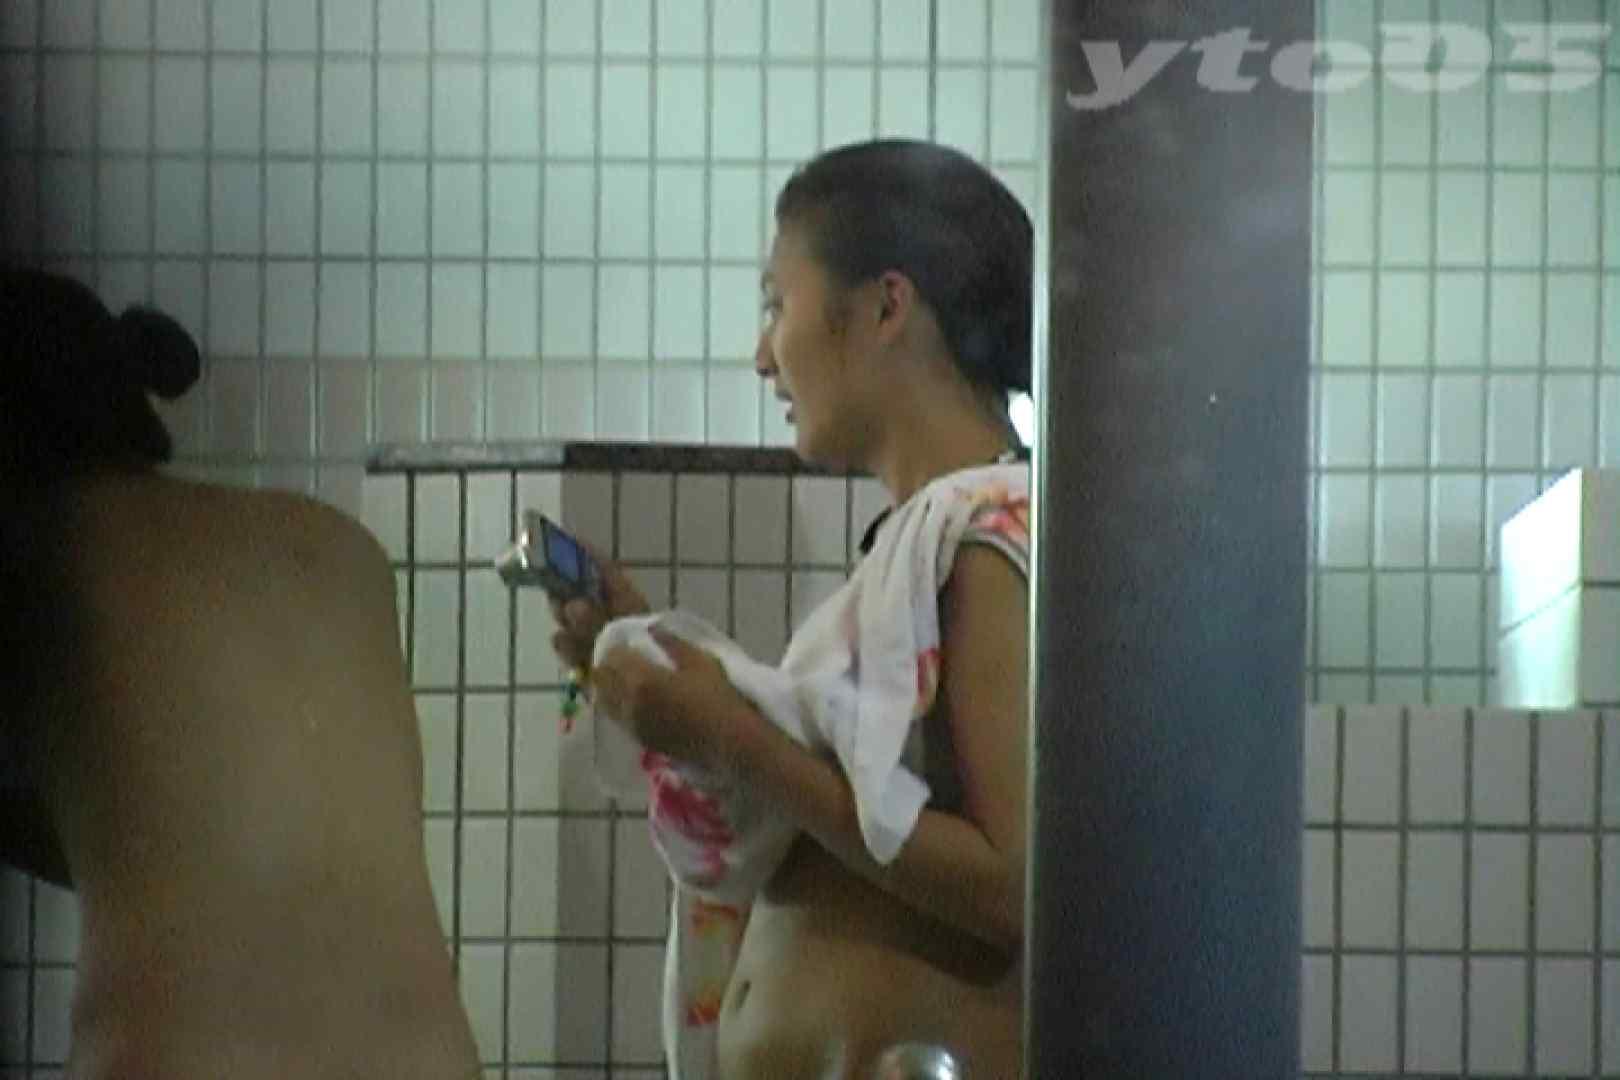 ▲復活限定▲合宿ホテル女風呂盗撮 Vol.31 期間限定 AV無料 85pic 27